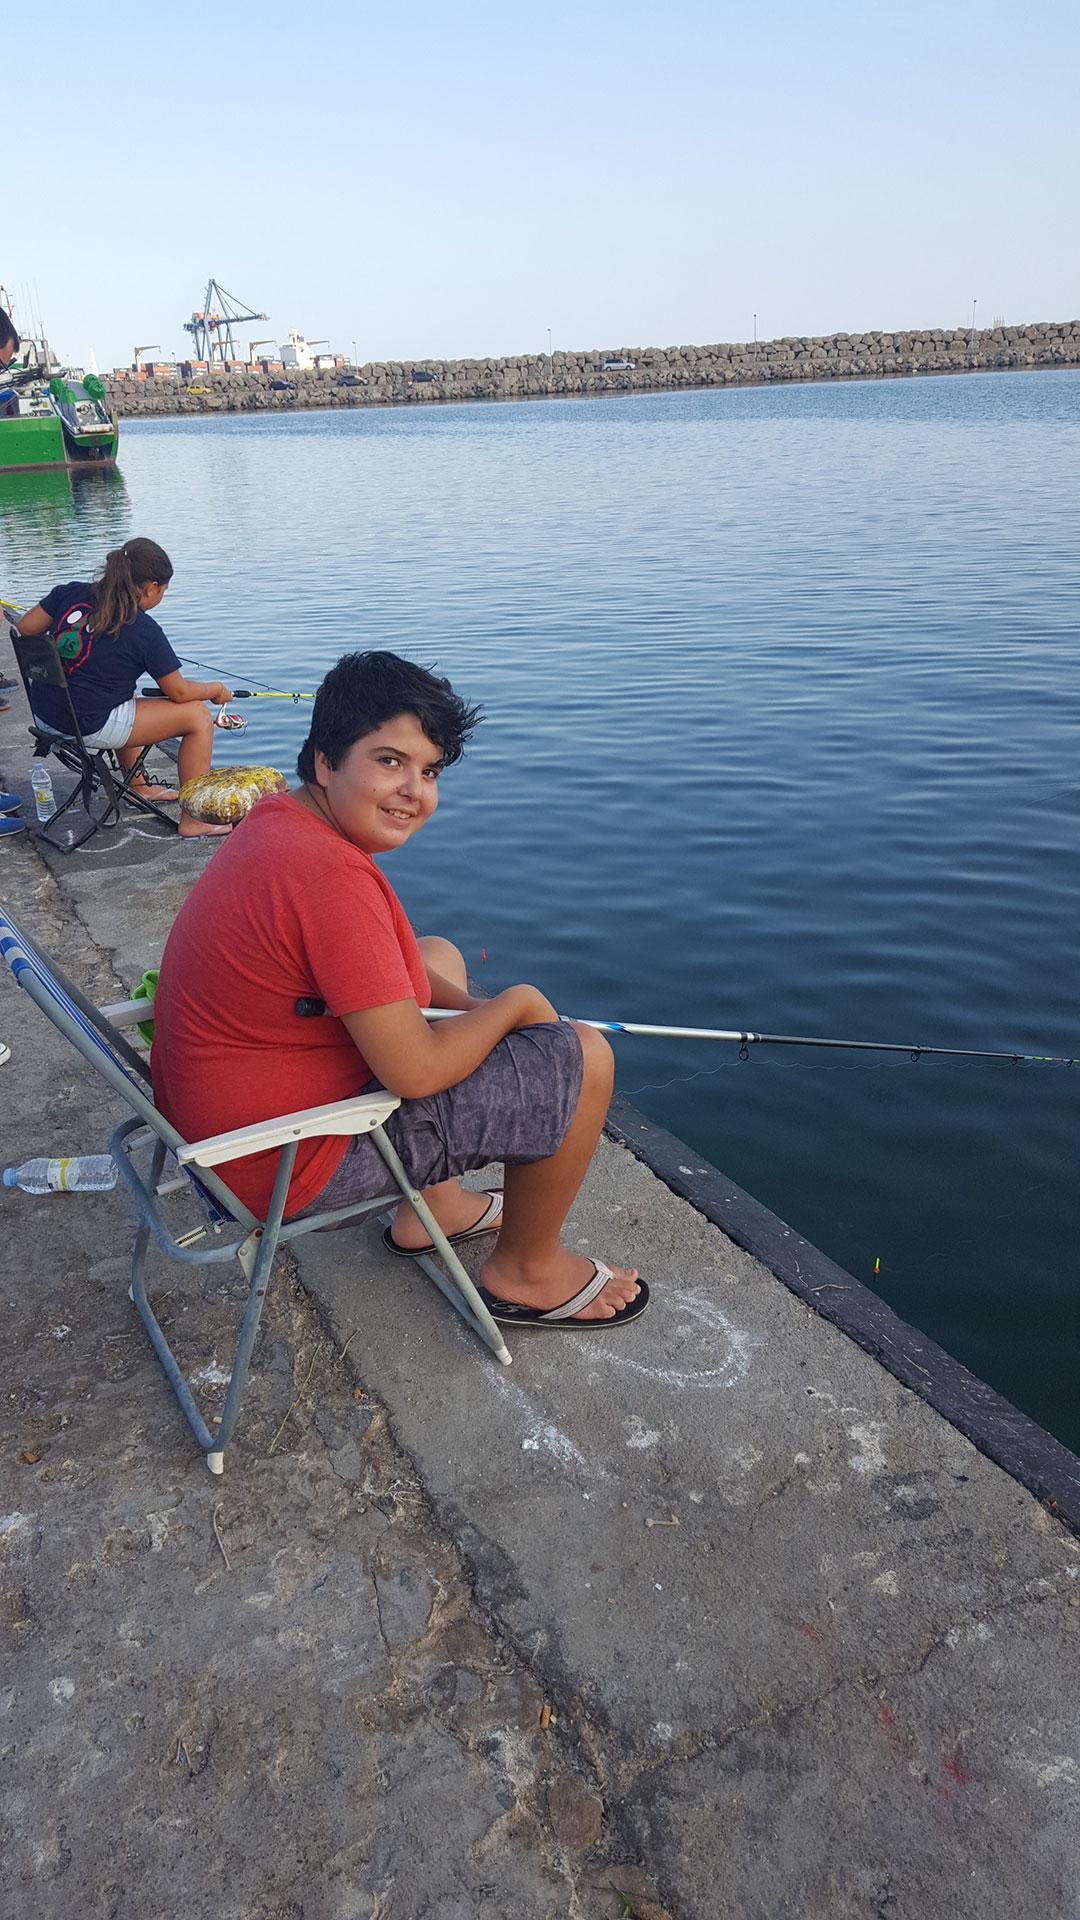 160811-curso-pesca-191646